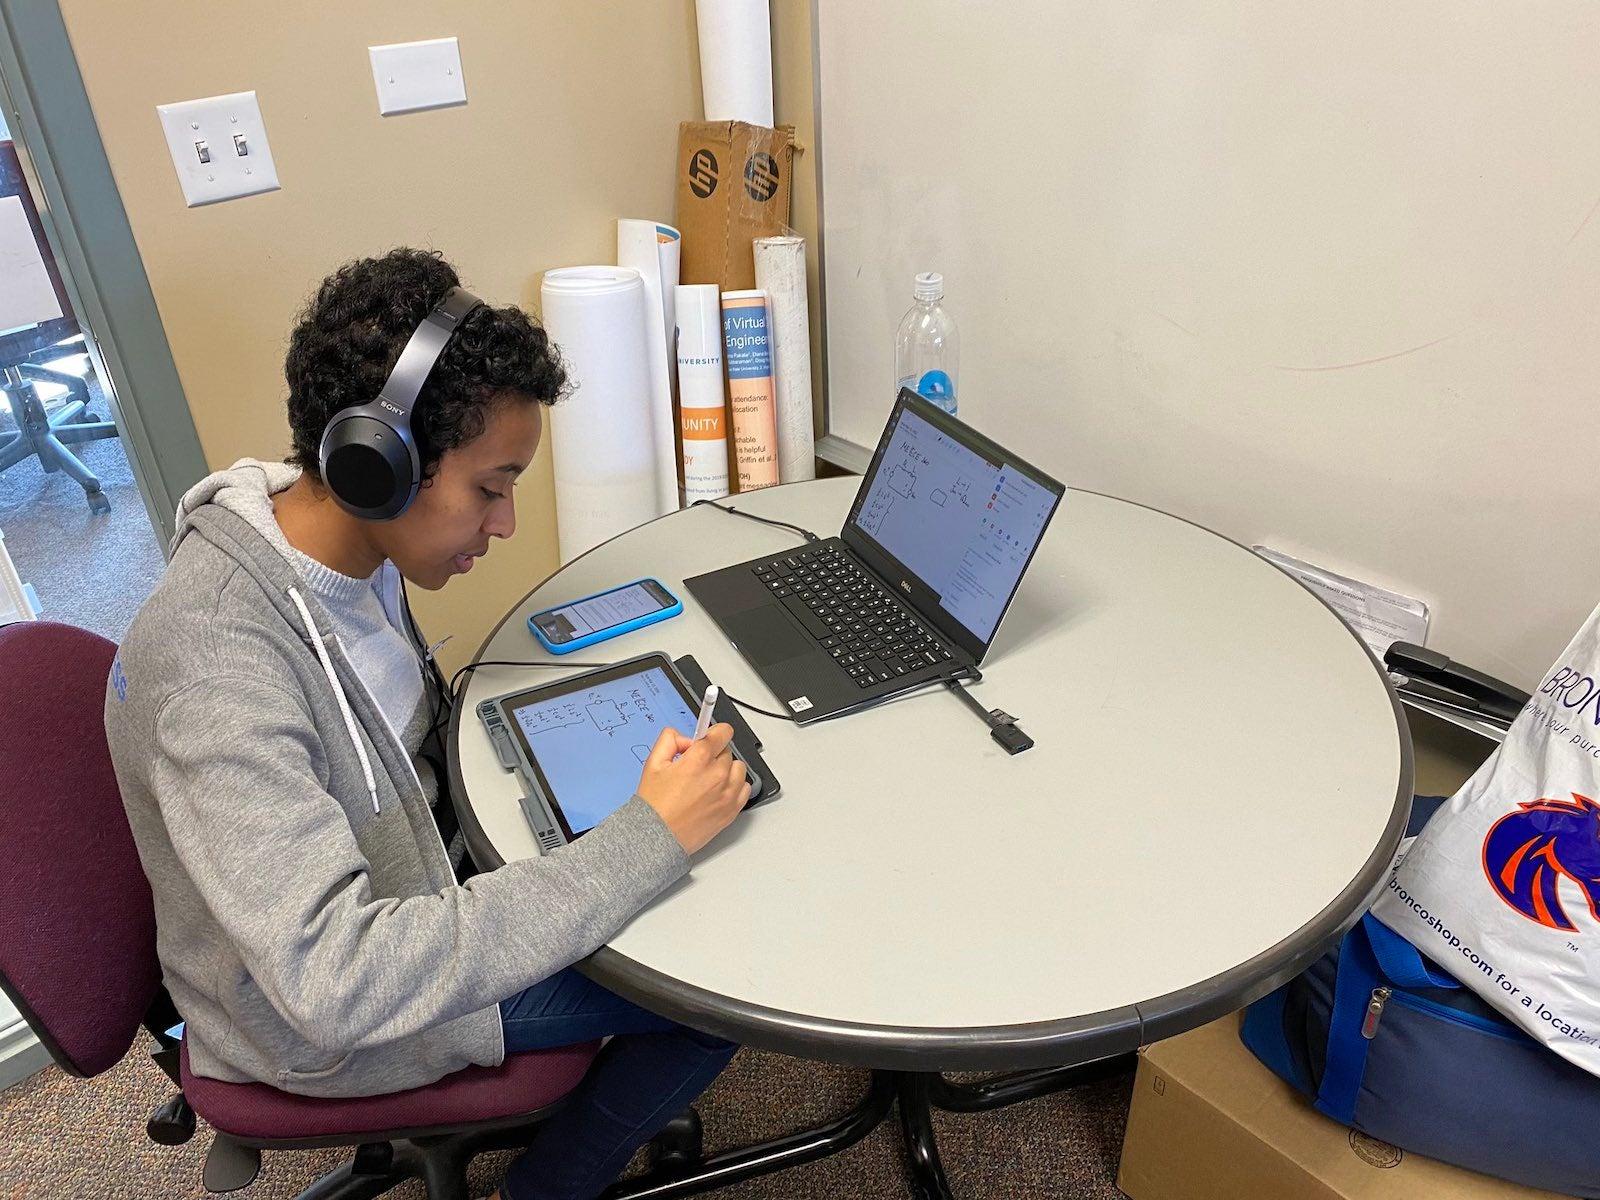 Nardos Ashenafi conducts an online tutoring session